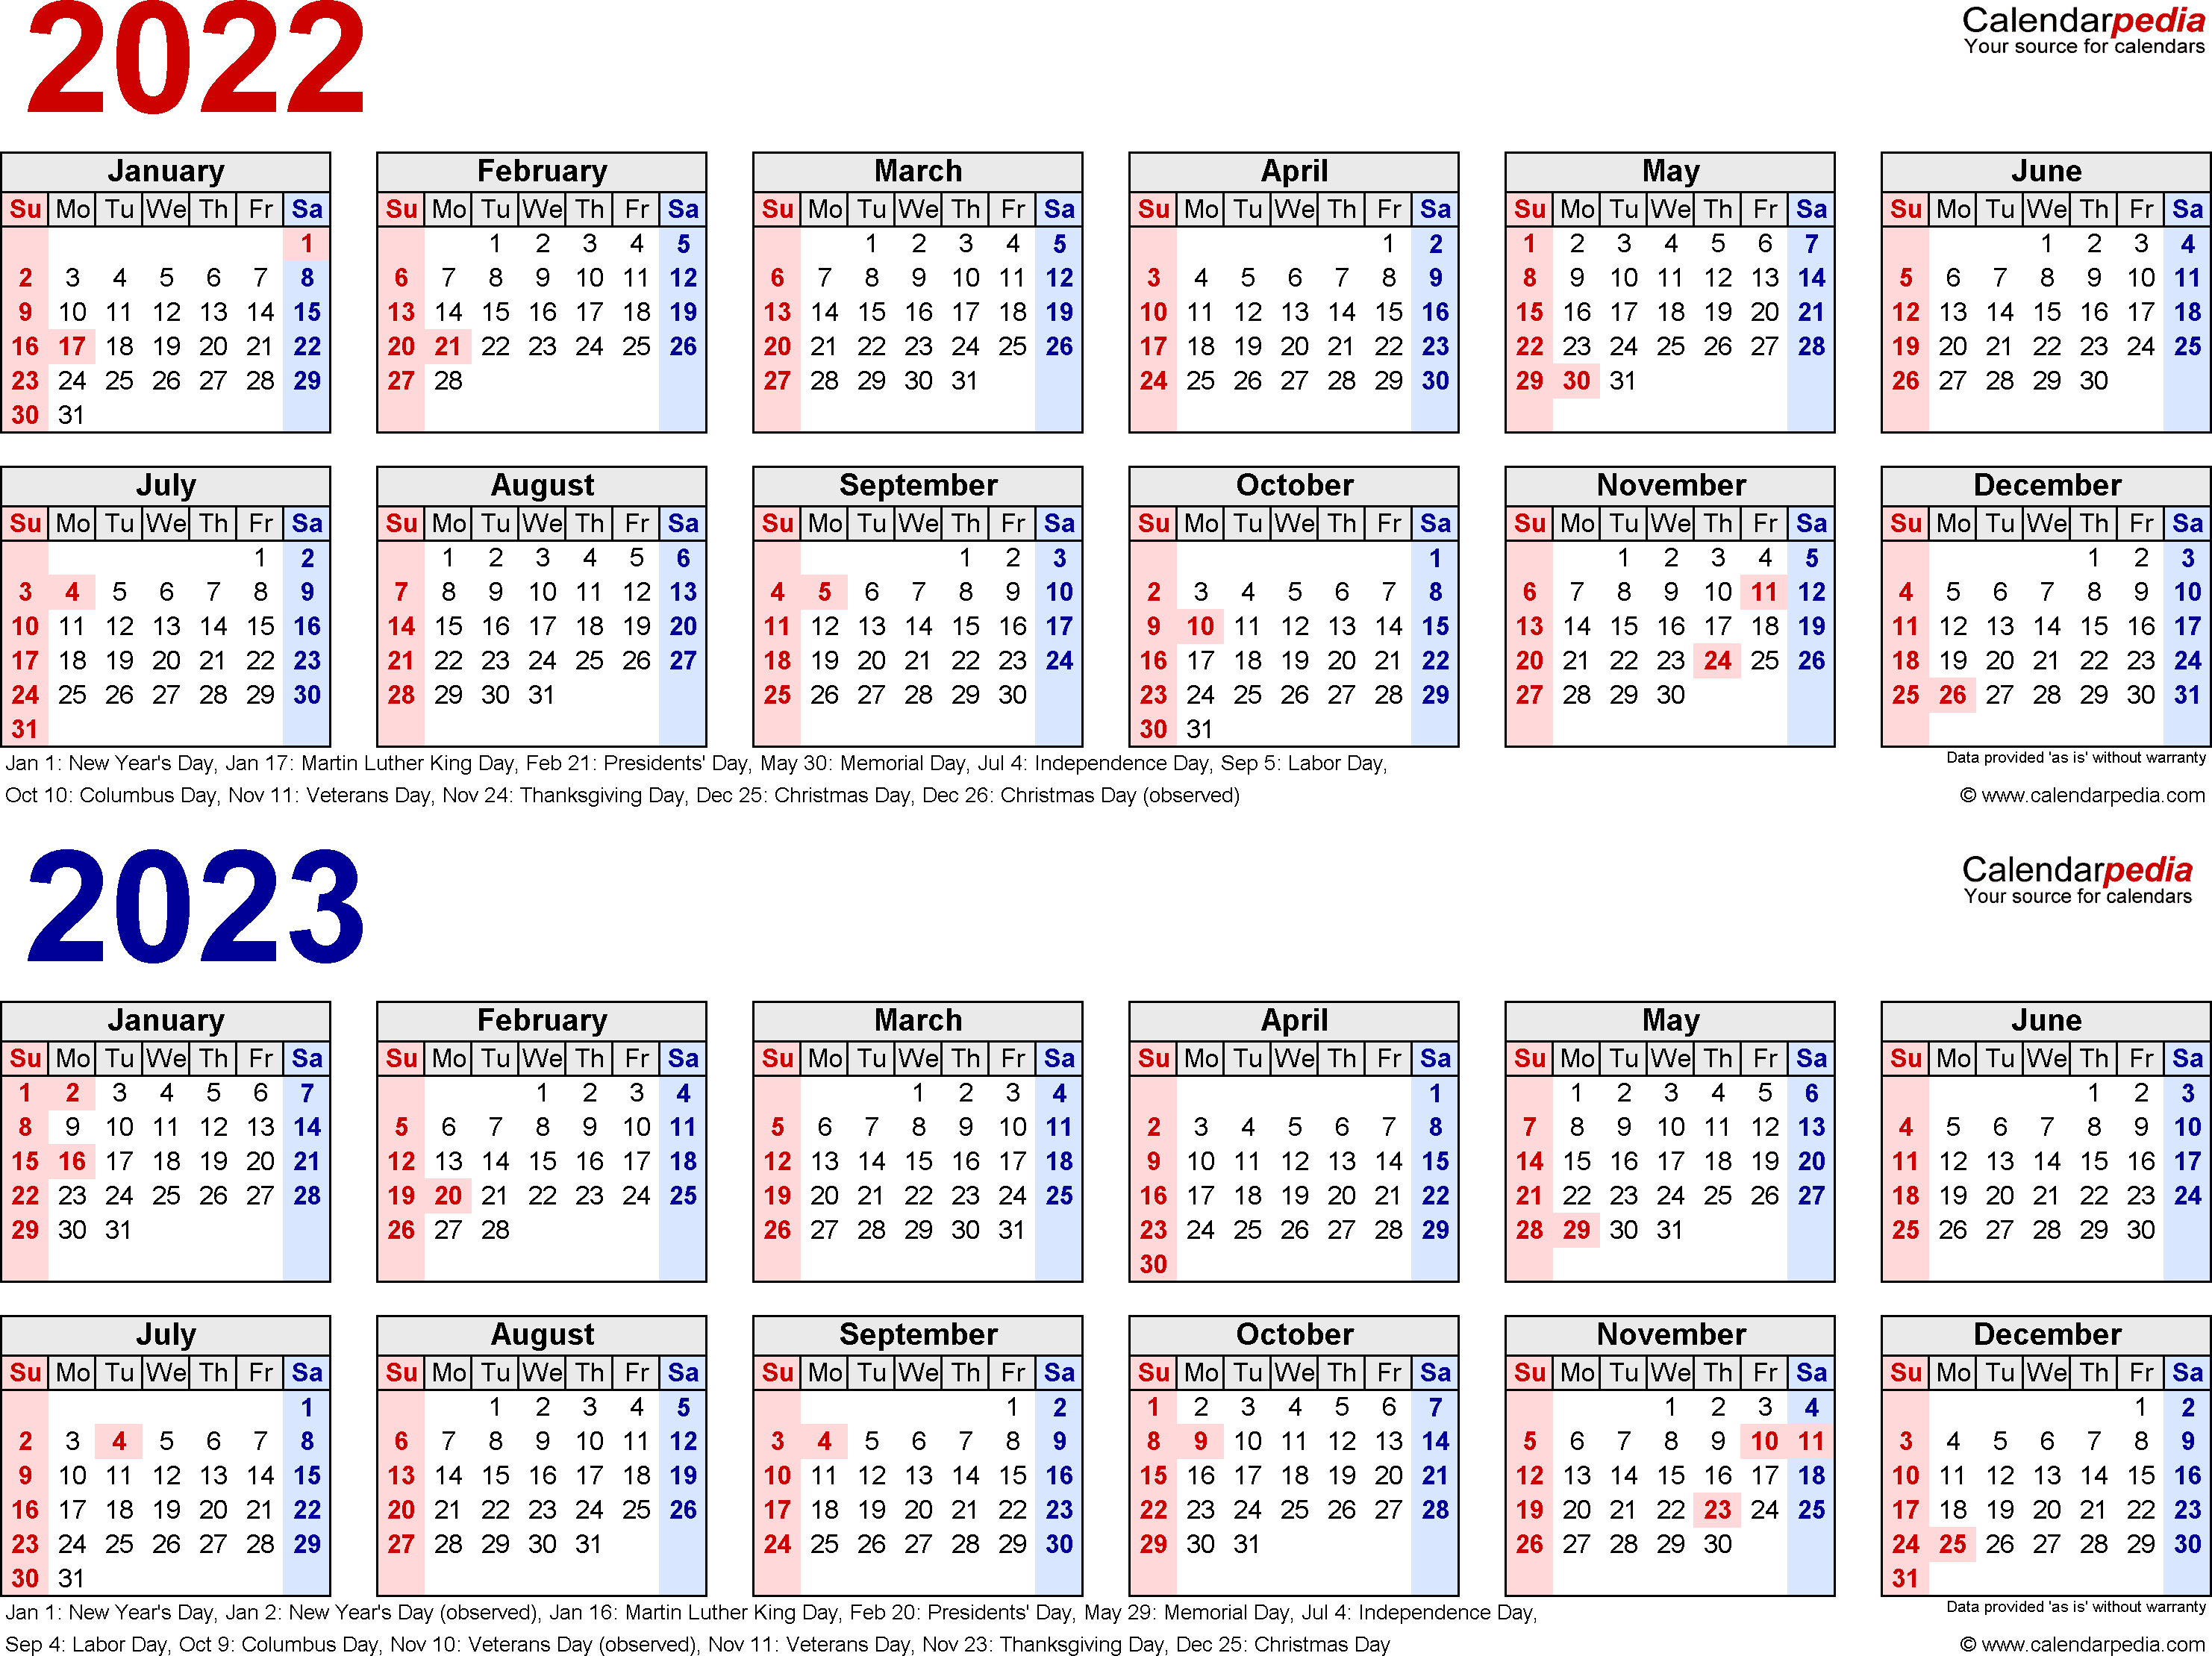 2022-2023 Calendar - Free Printable Two-Year Word Calendars with Blank Year Long Calendar 2022